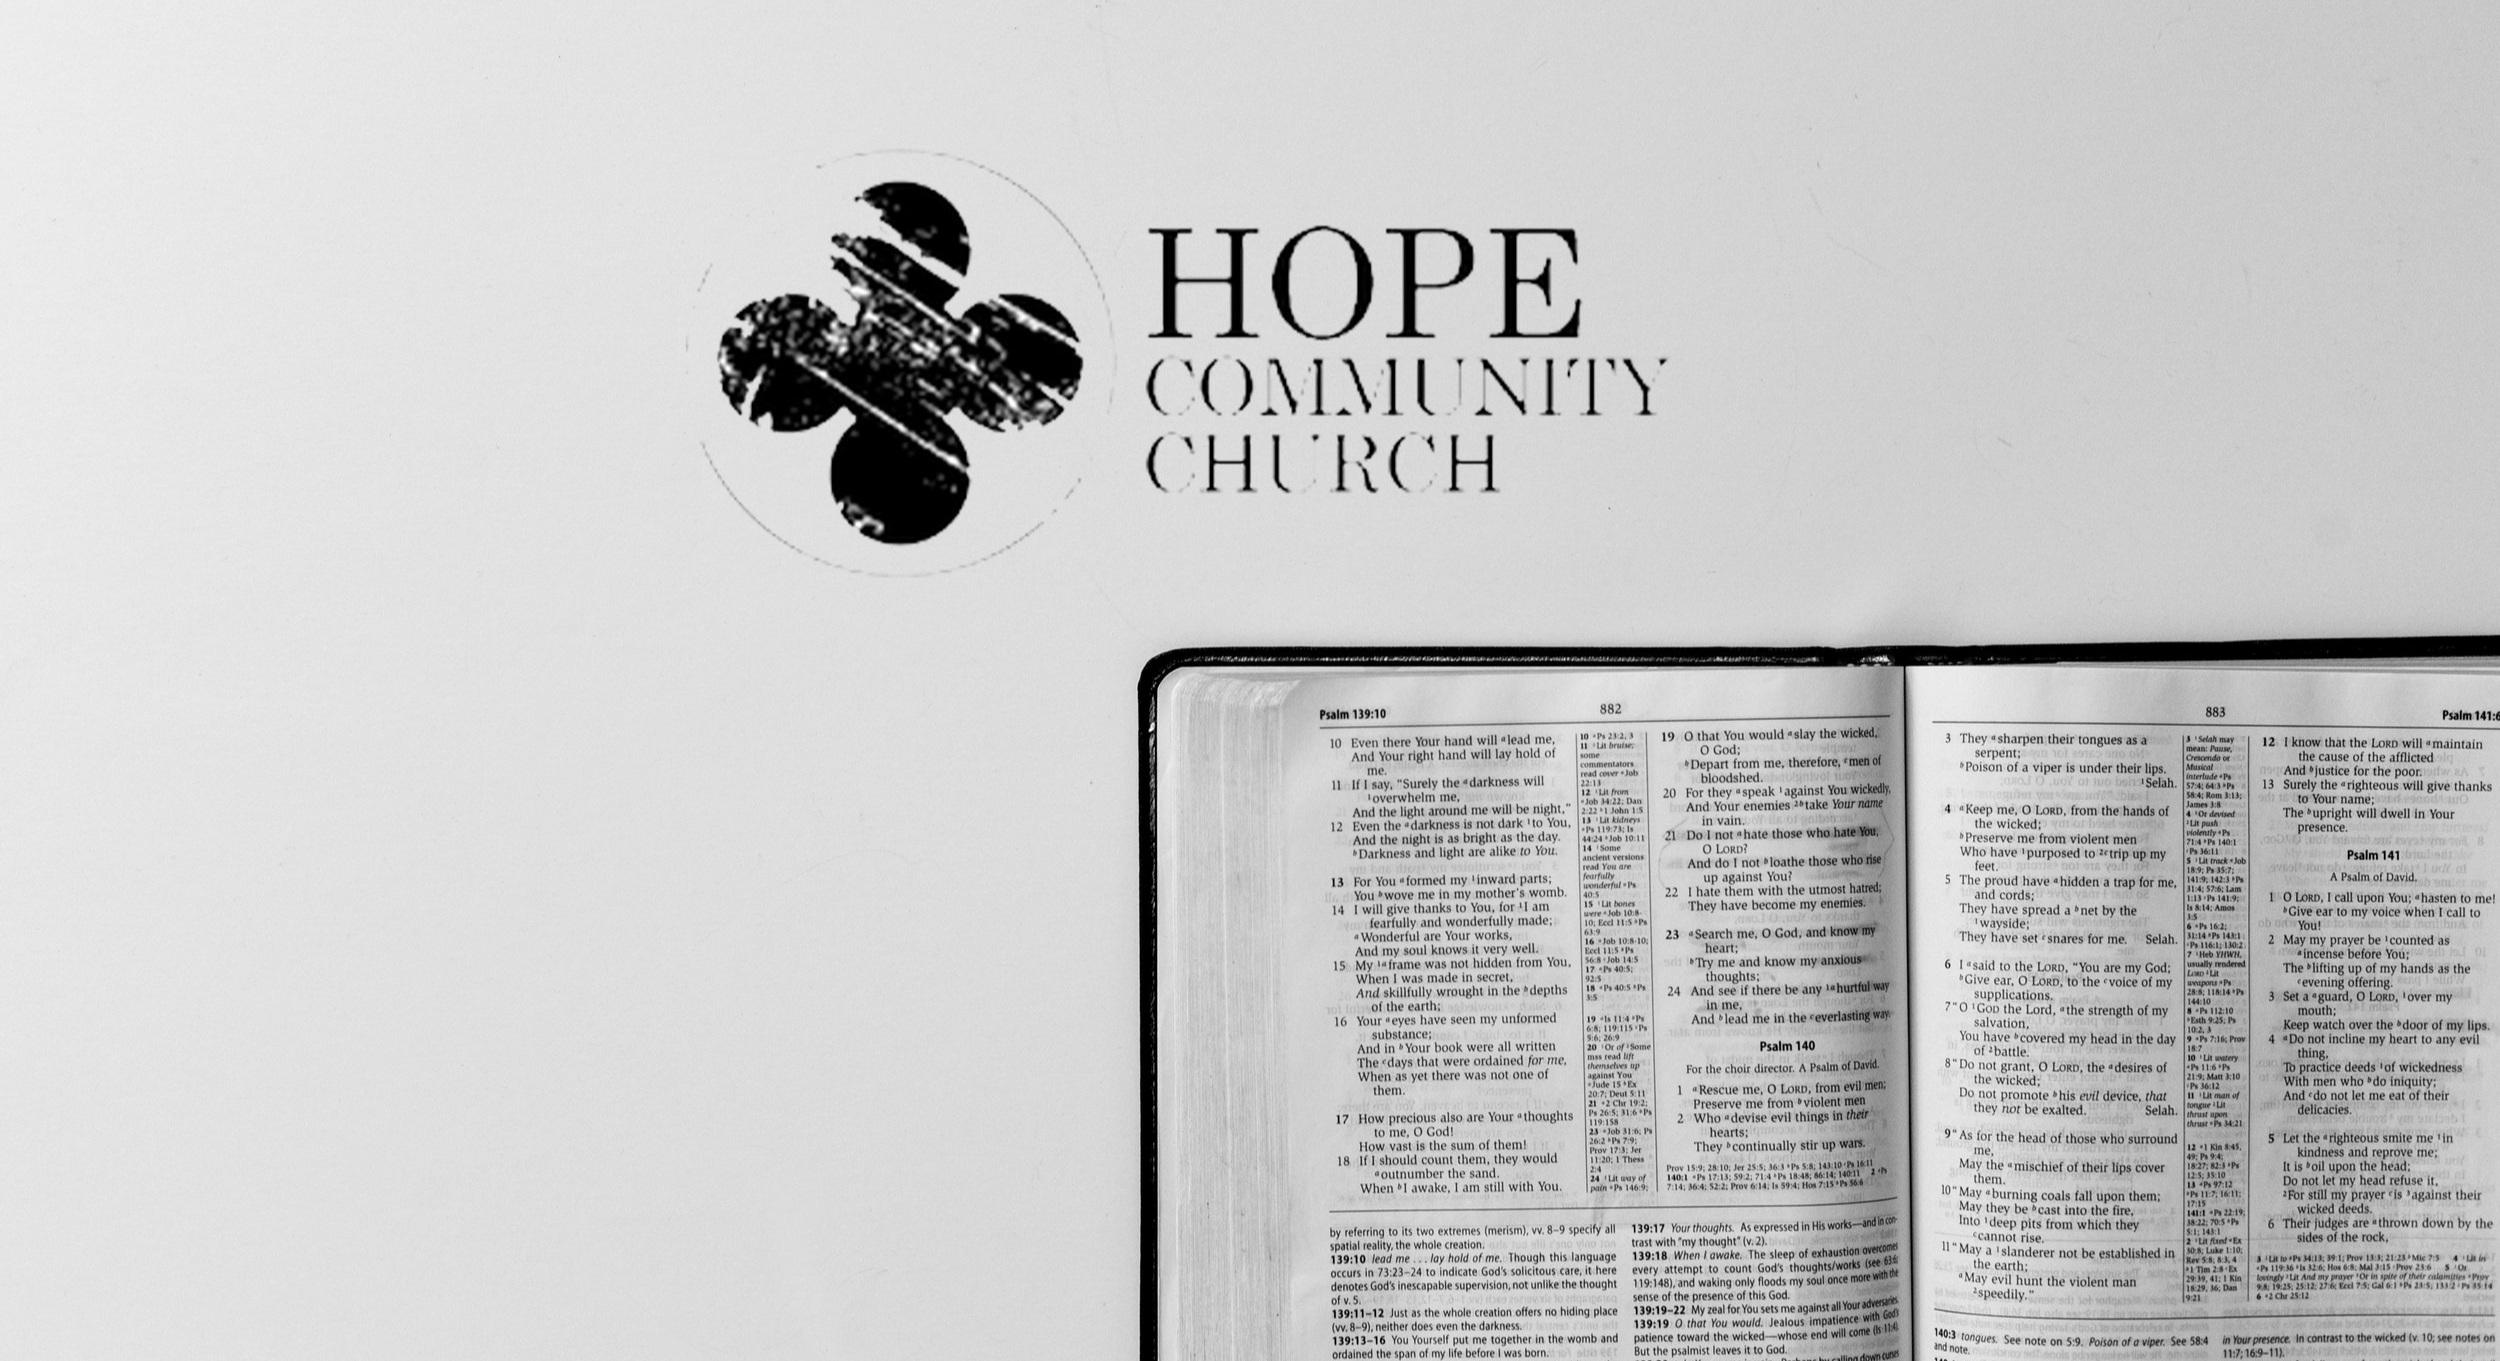 HopeCoverImage.jpg